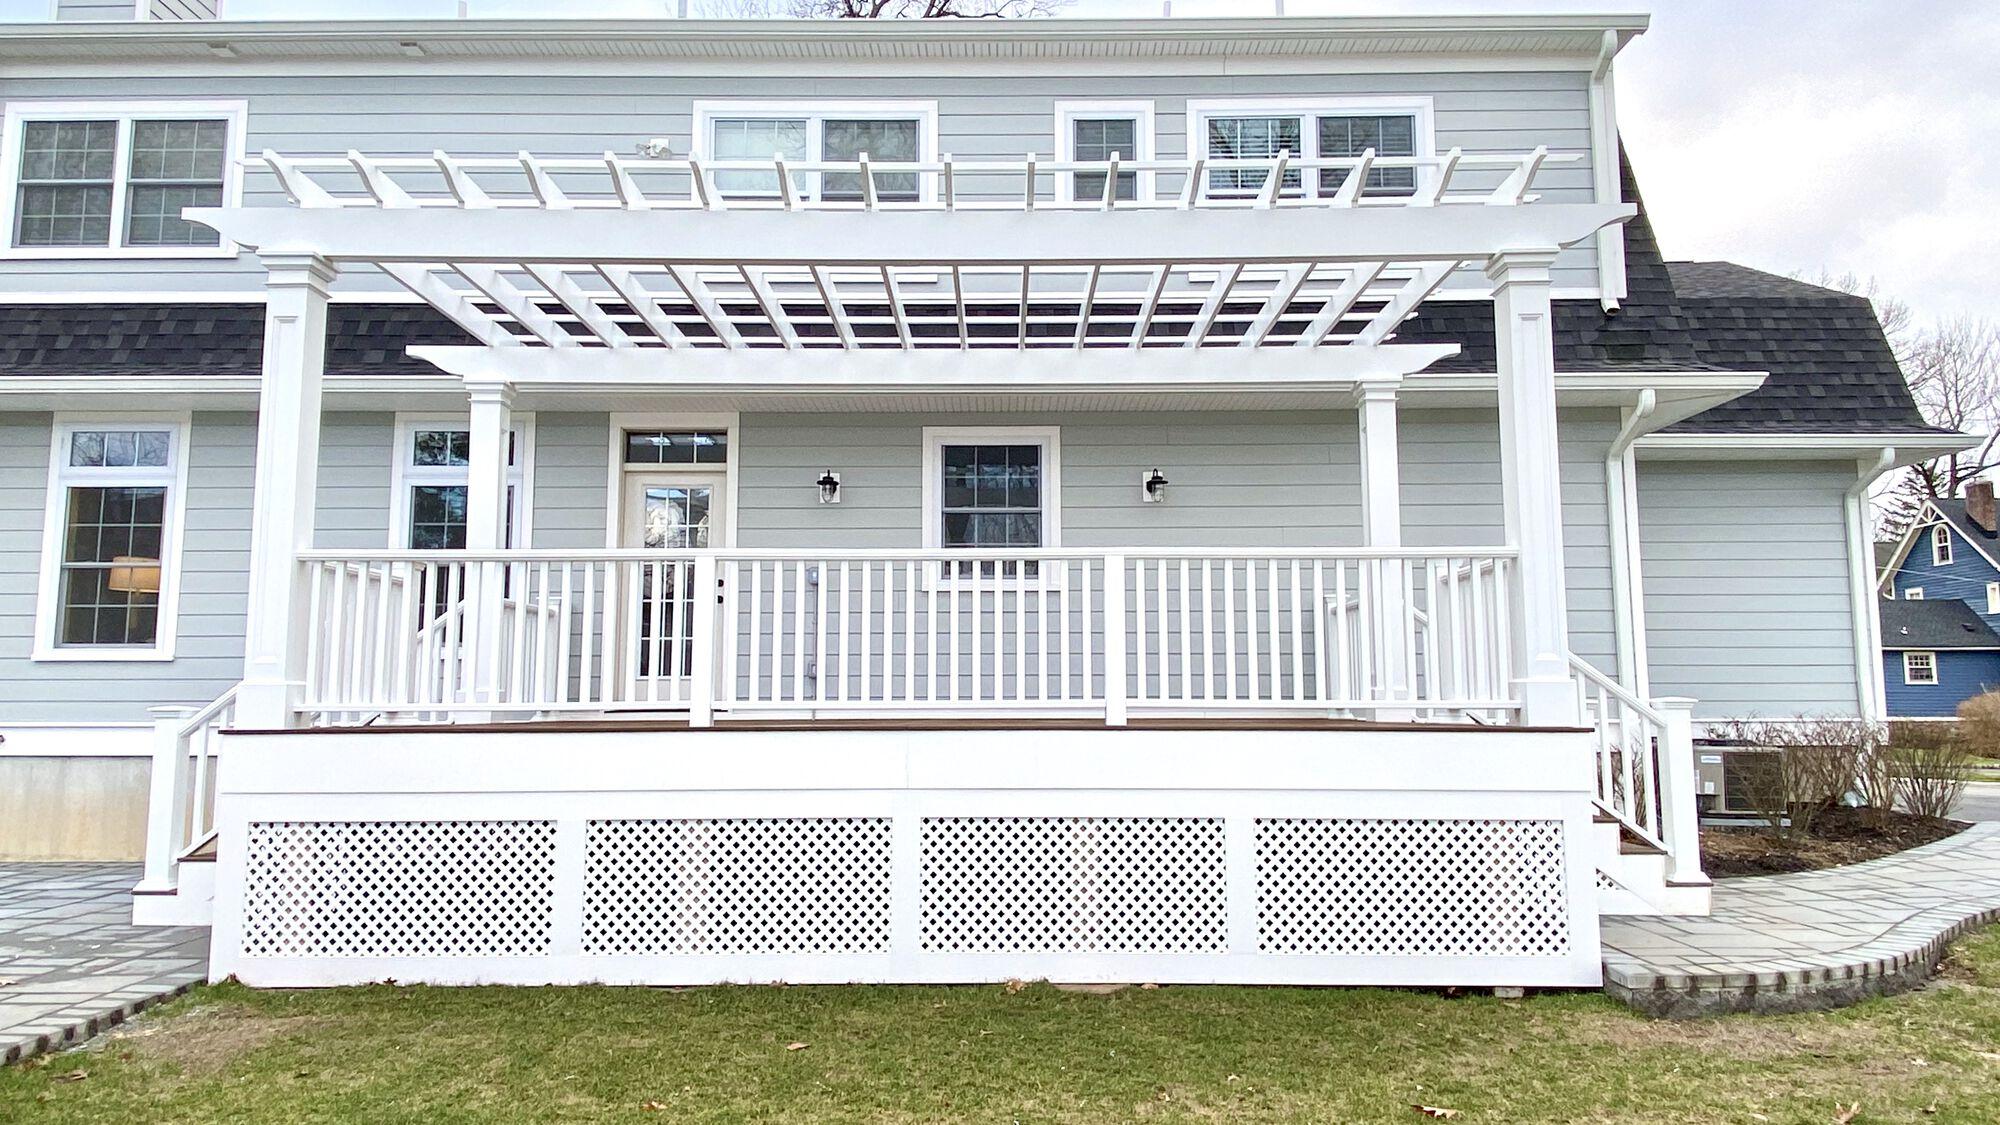 Custom Composite Deck and Pergola in Chatham, Morris County NJ